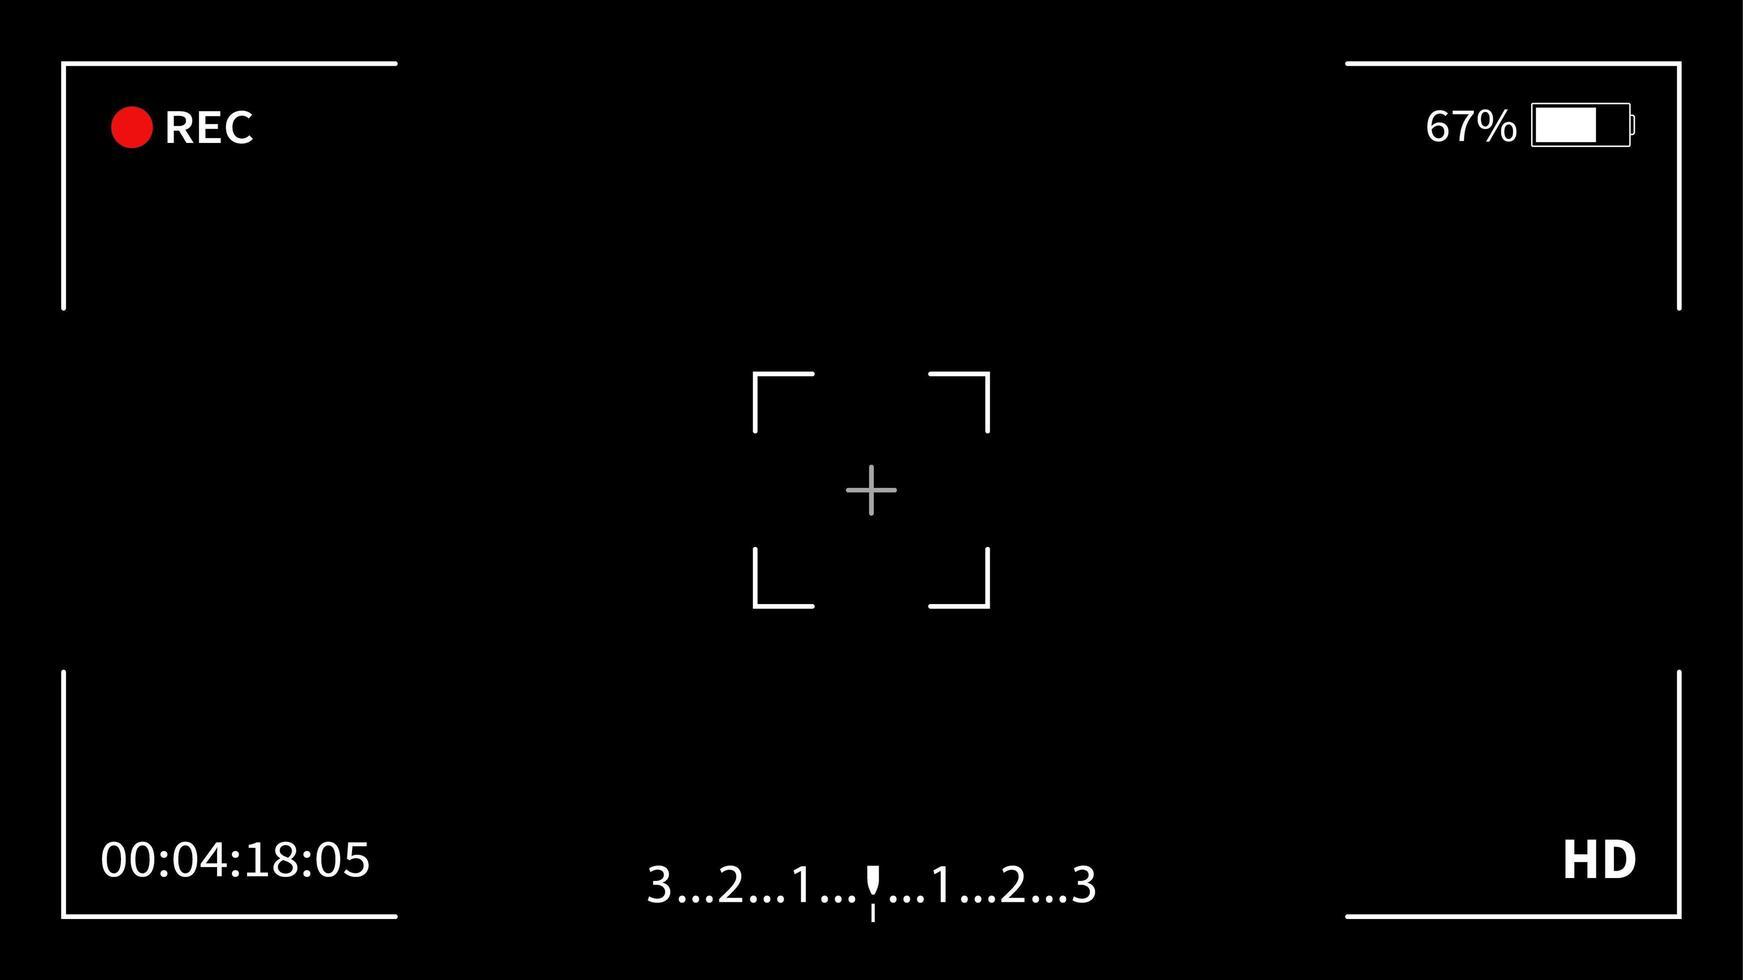 Schnittstellensucher Digitalkamera vektor